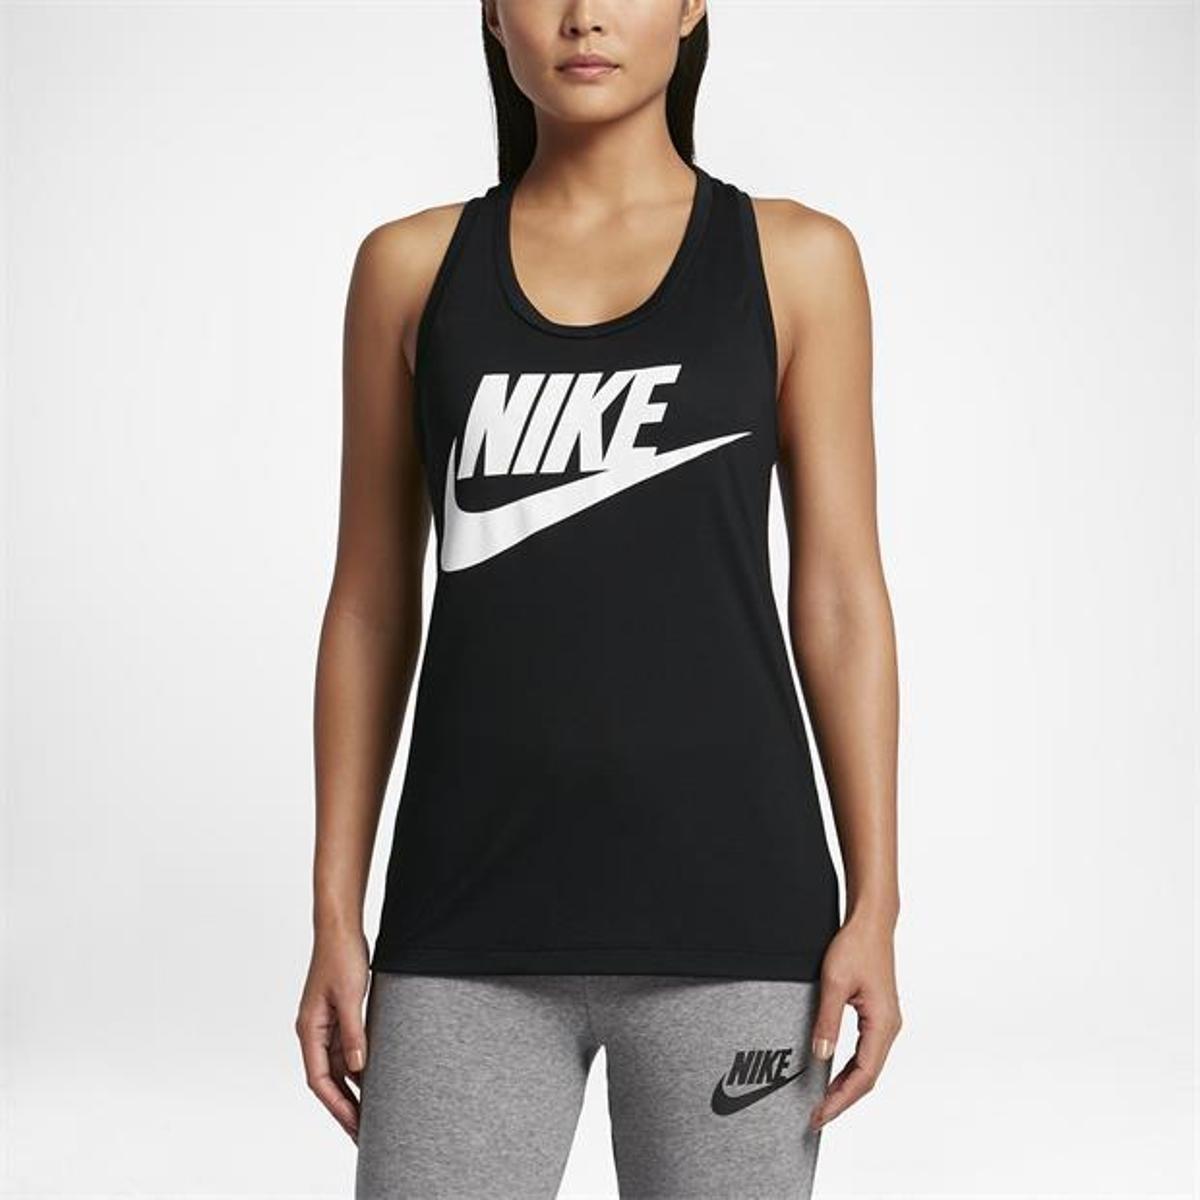 Camiseta Regata Nike Sportswear Essential Feminina e82c2c2a3da